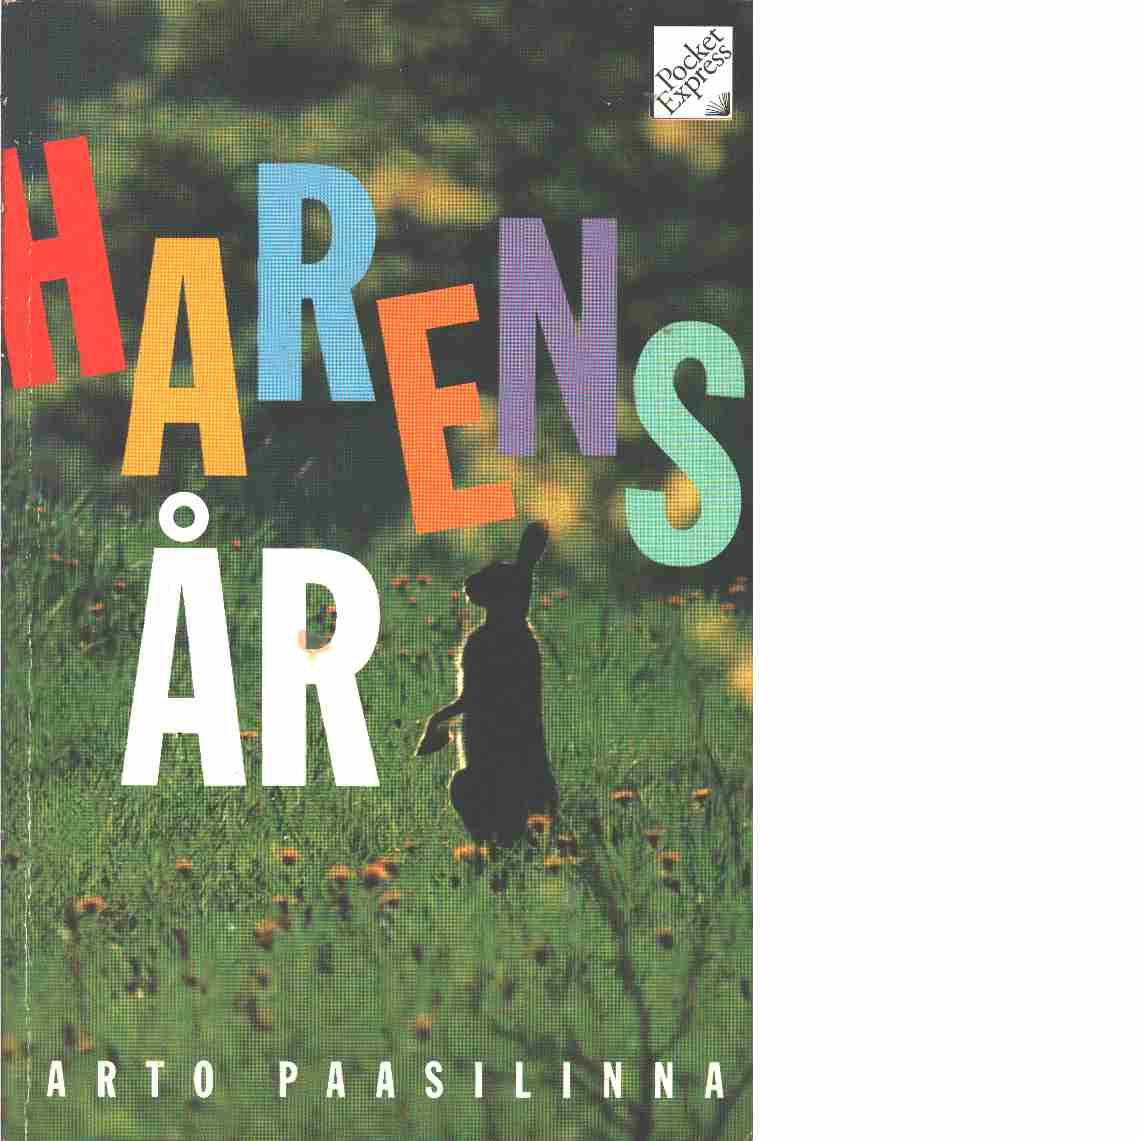 Harens år - Paasilinna, Arto